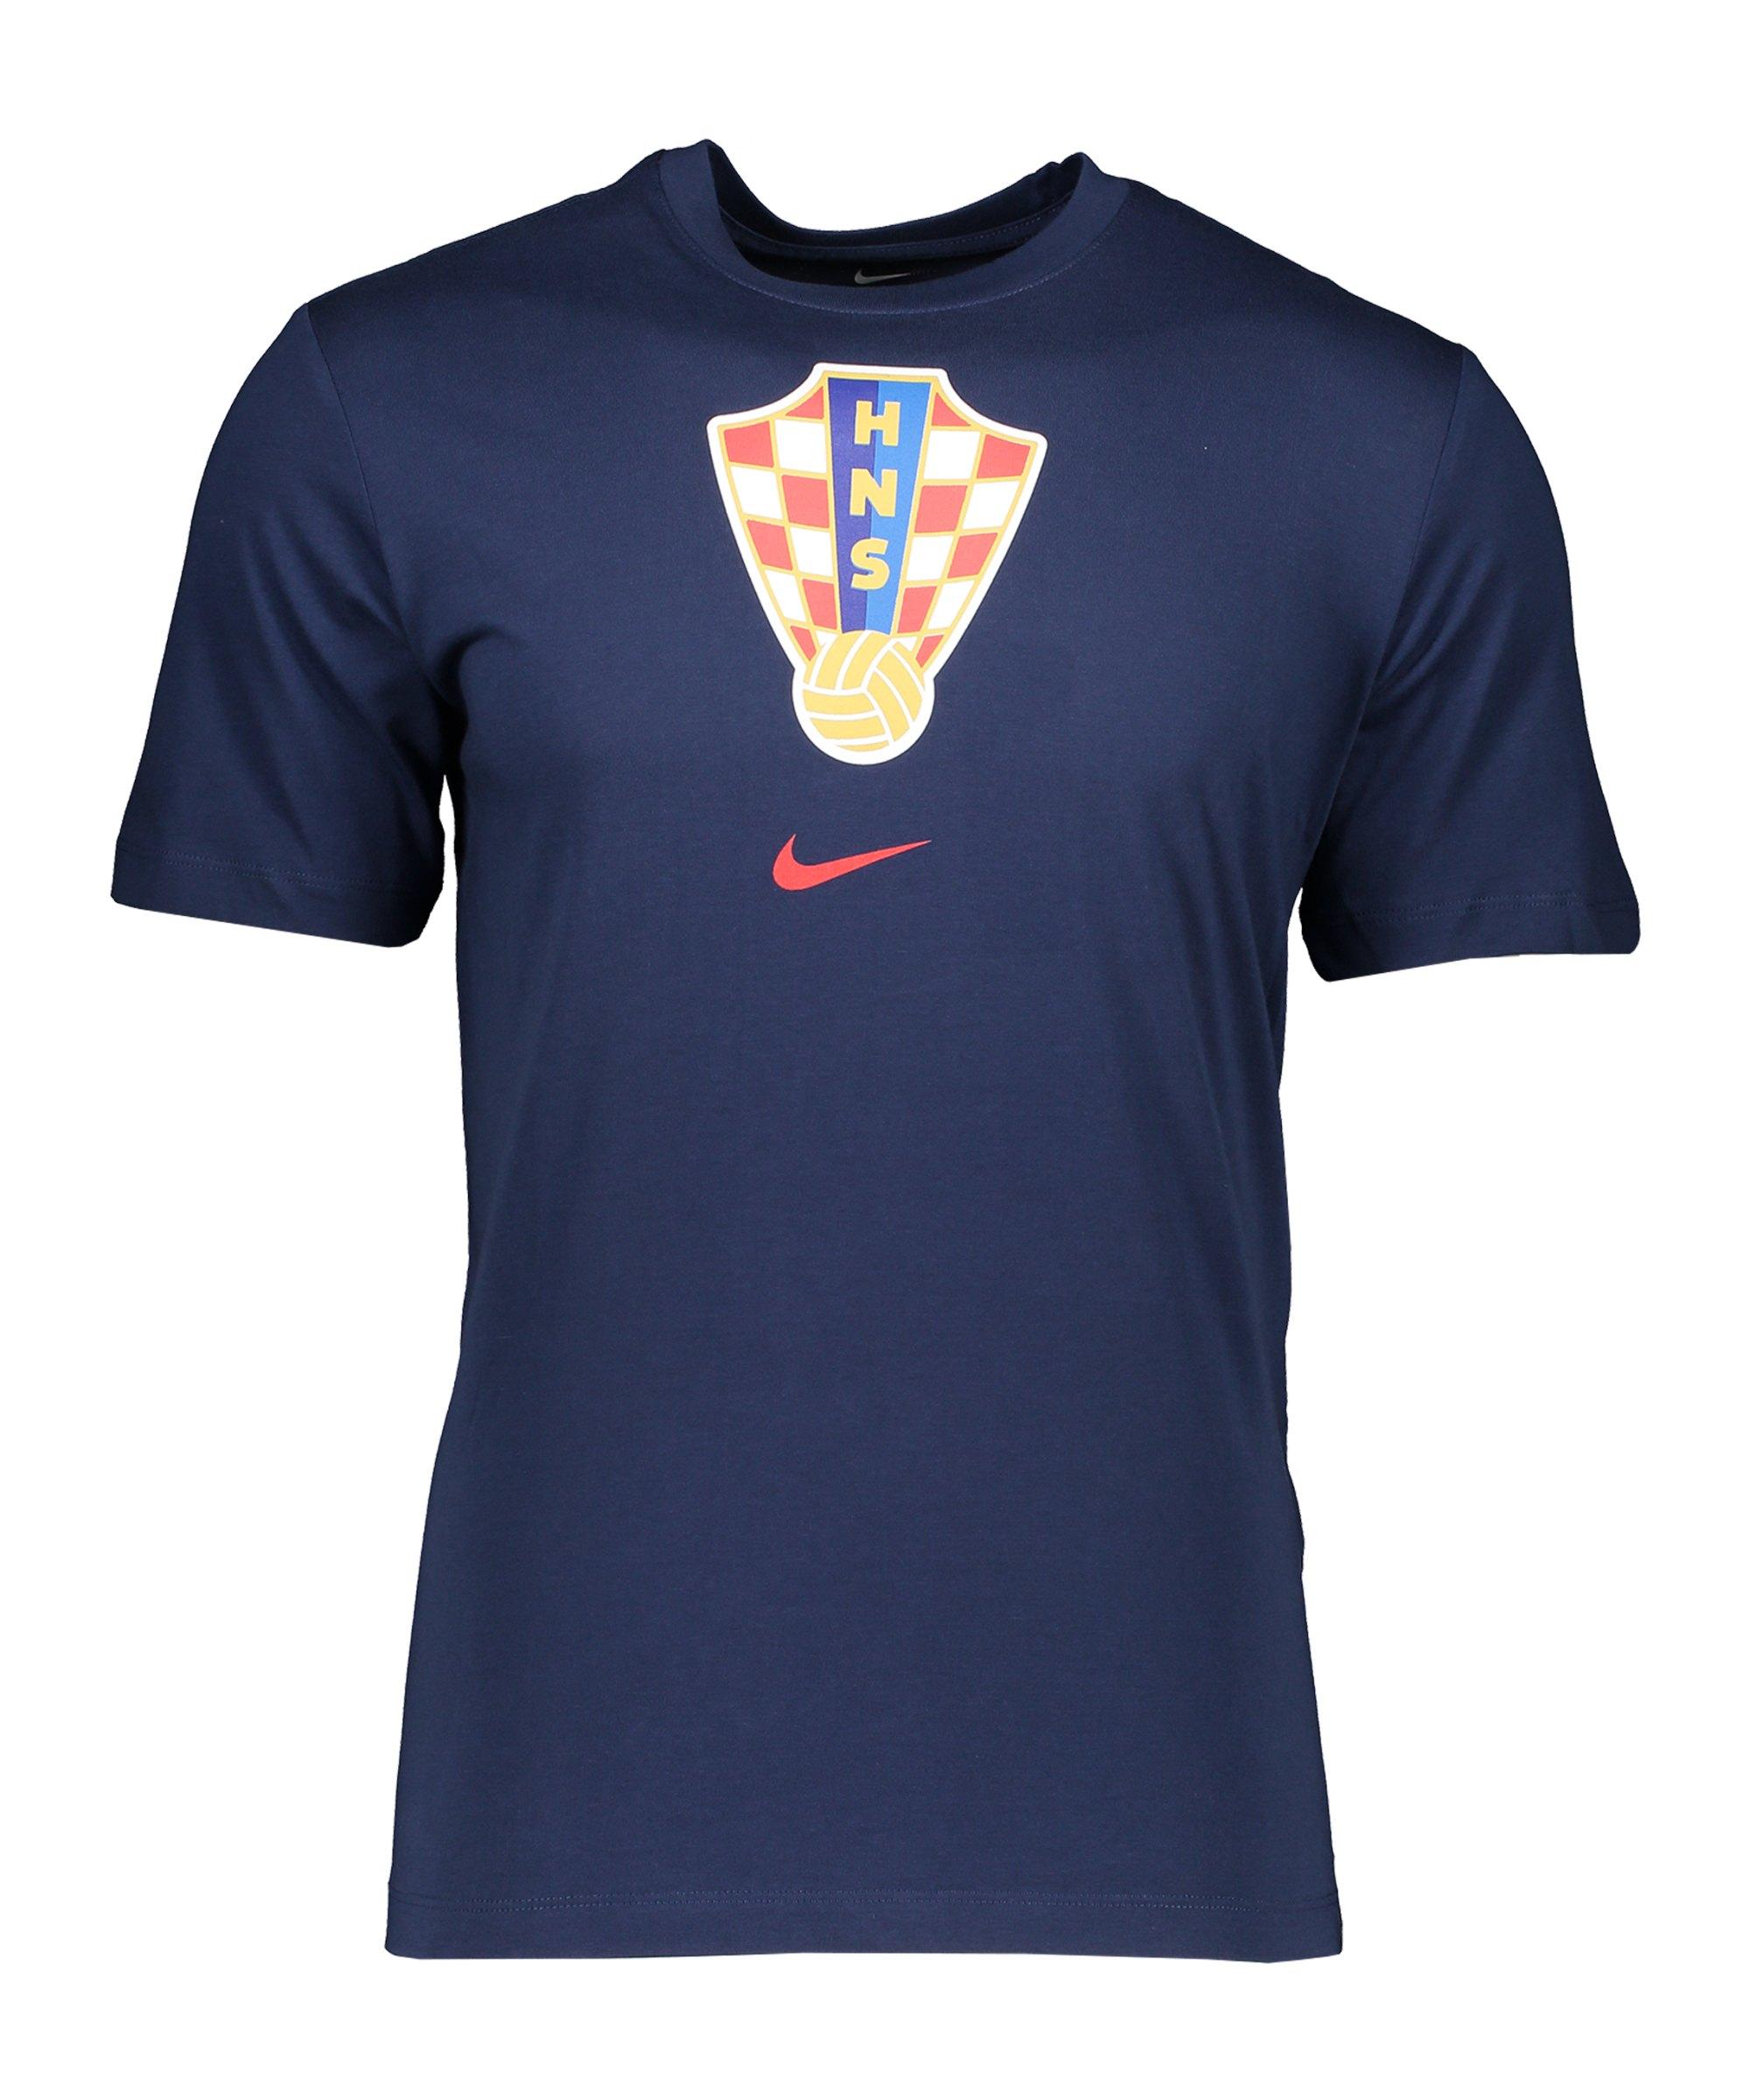 Nike Kroatien Evergreen Crest Tee T-Shirt F410 - blau